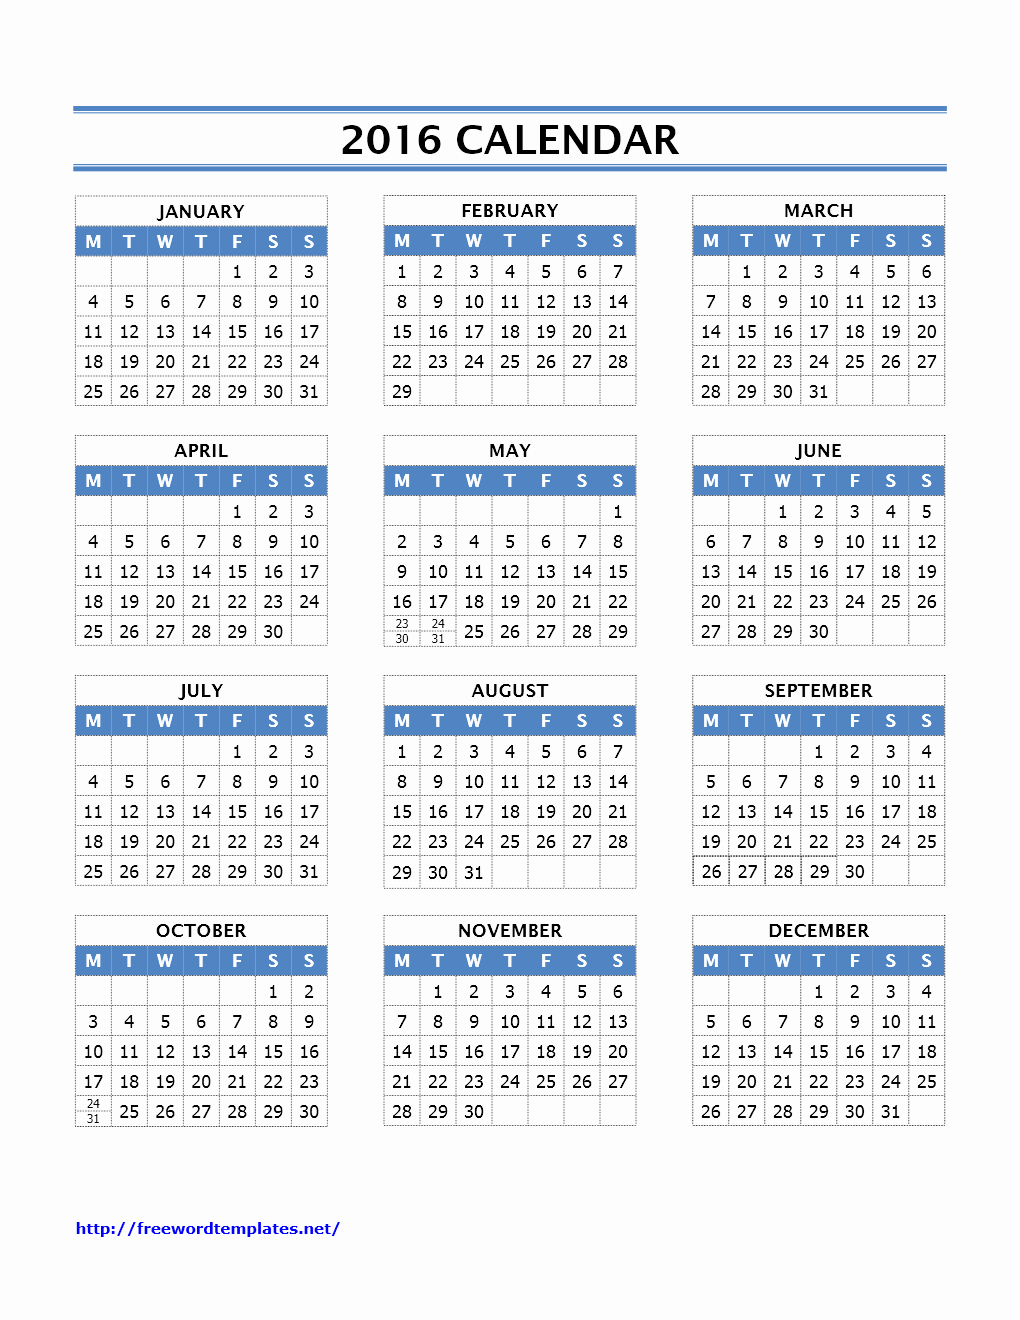 2016 Calendar Excel with Holidays Beautiful December 2016 Calendar Printable E Page – 2017 Printable